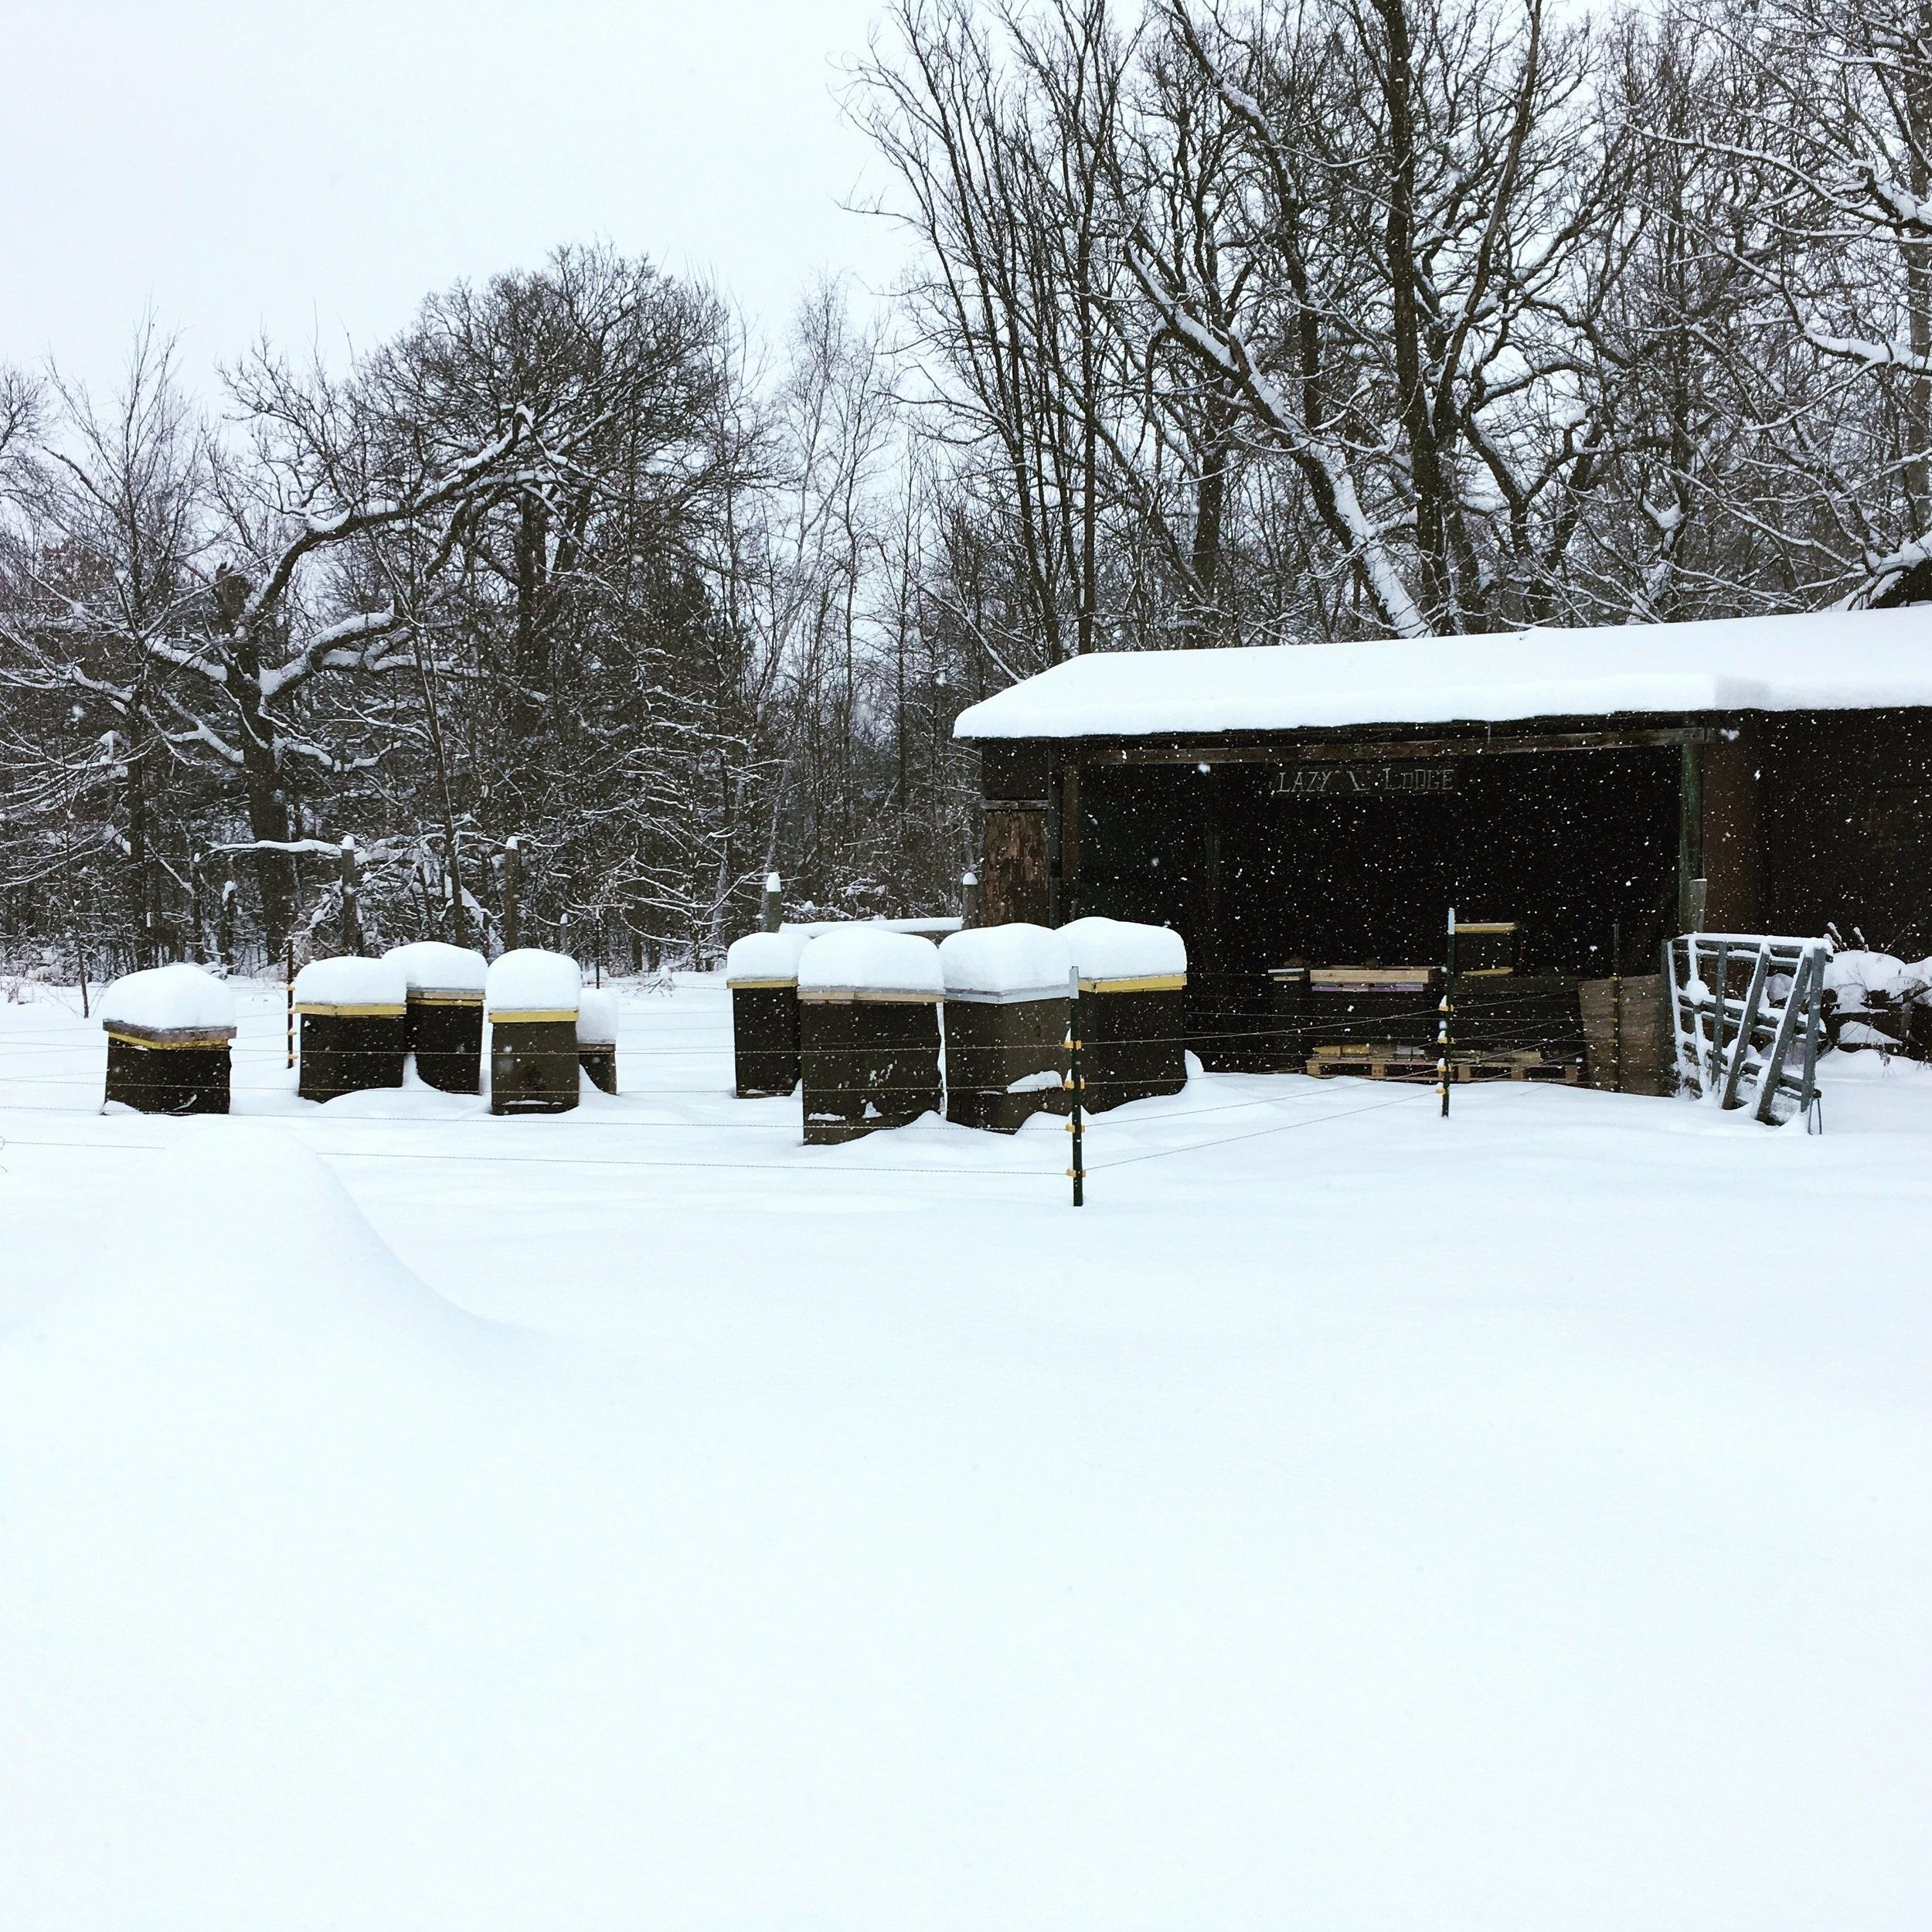 winter+in+the+beeyard.jpg